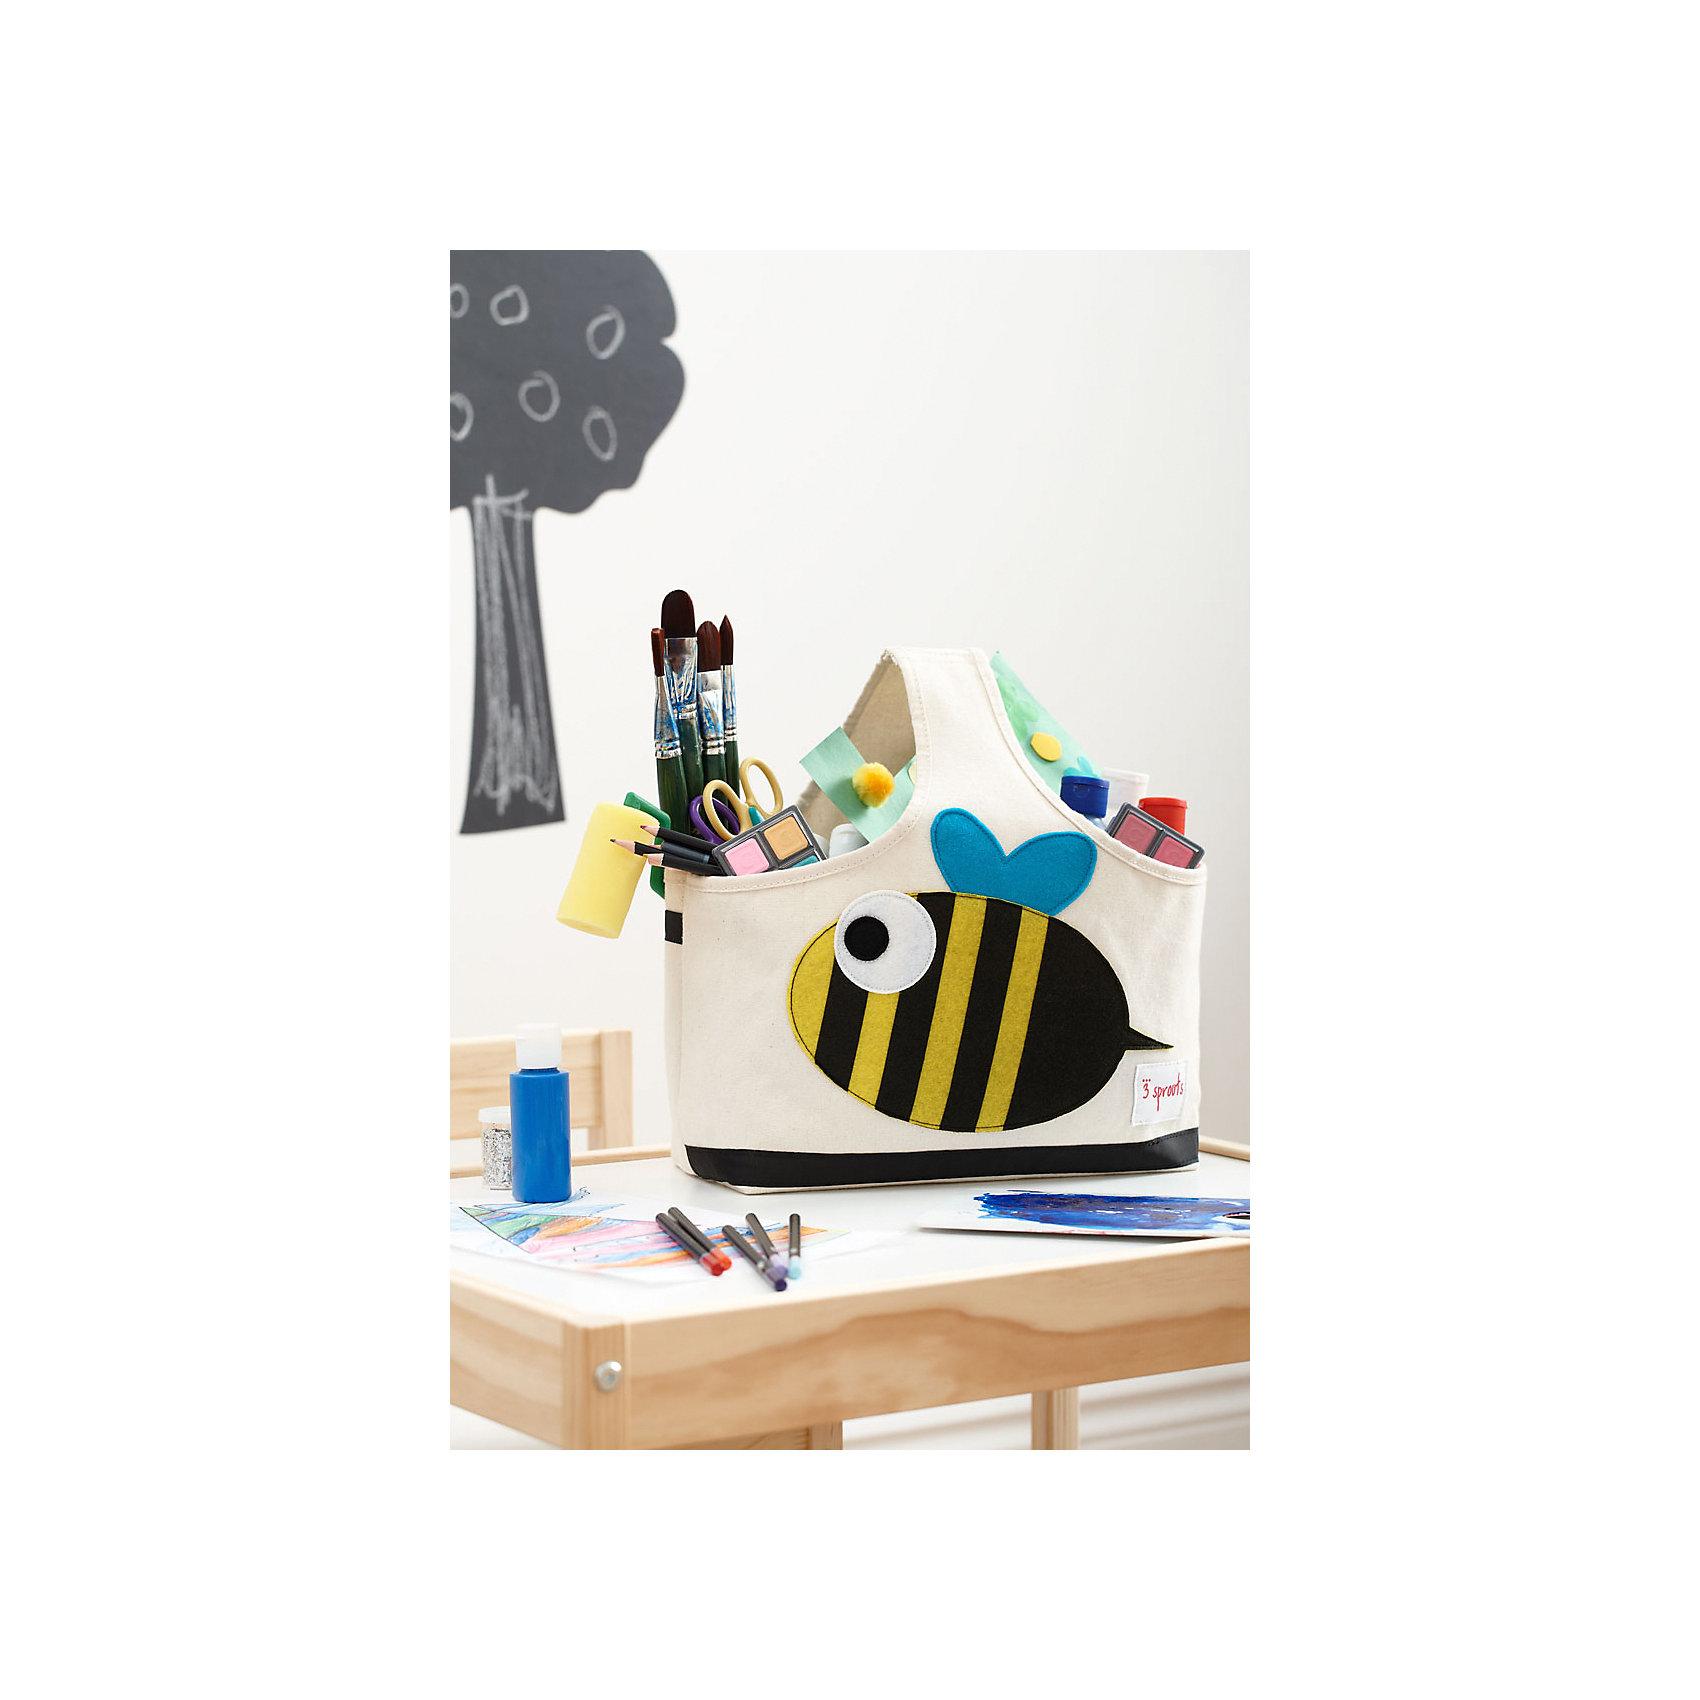 Сумочка для хранения детских принадлежностей Пчёлка (Black&Yellow Bee), 3 Sprouts от myToys